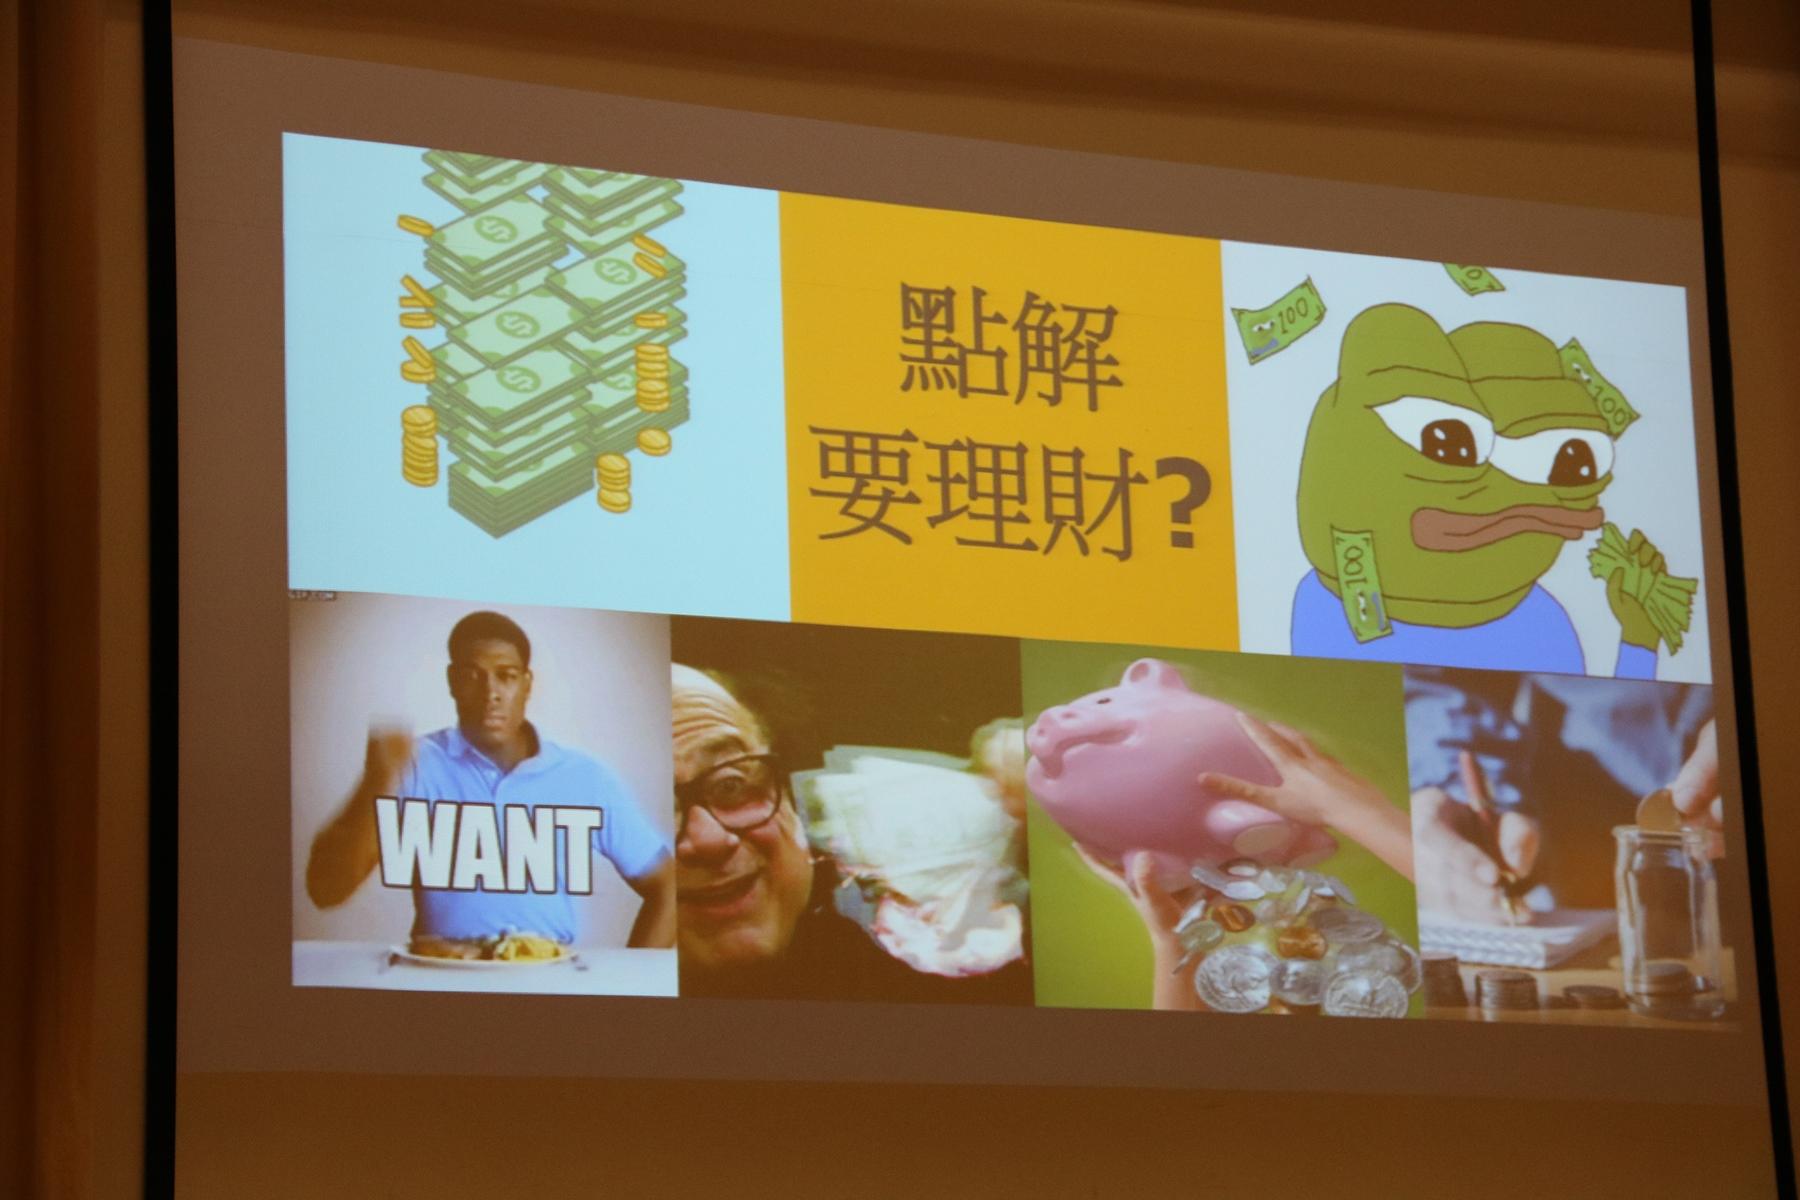 https://npc.edu.hk/sites/default/files/img_5984.jpg